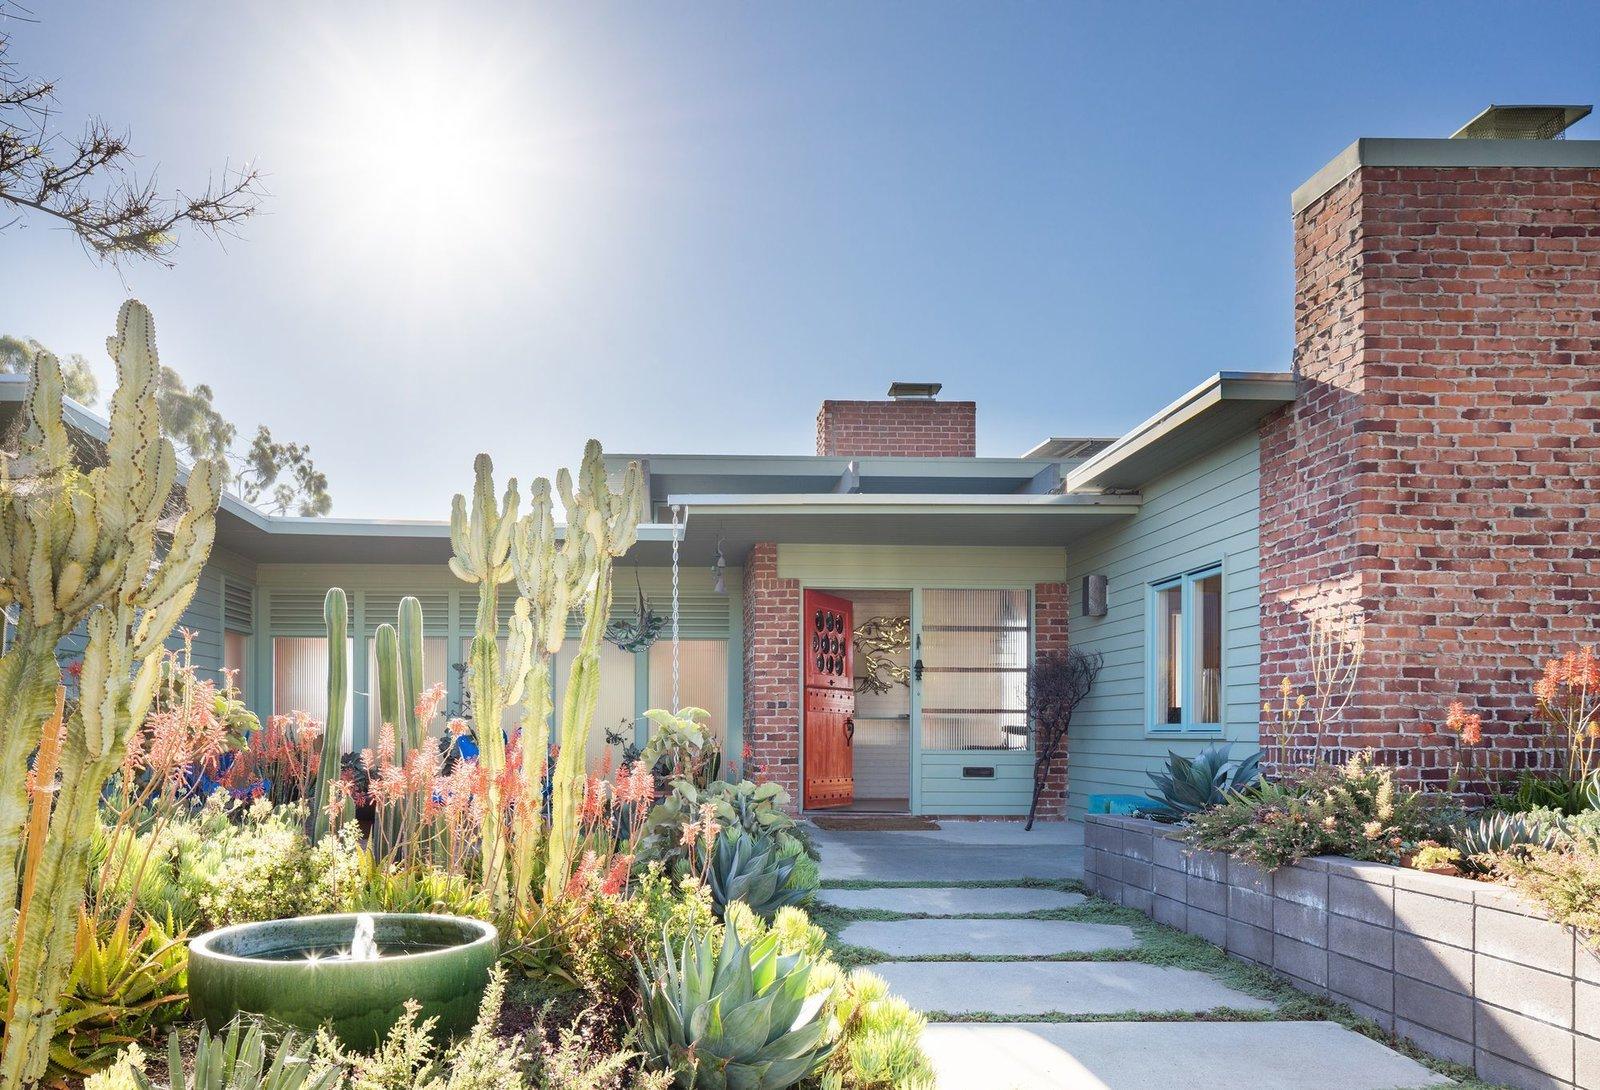 Via Curbed, photo by Darren Bradley  Photo 8 of 11 in This Week's 10 Best Houses